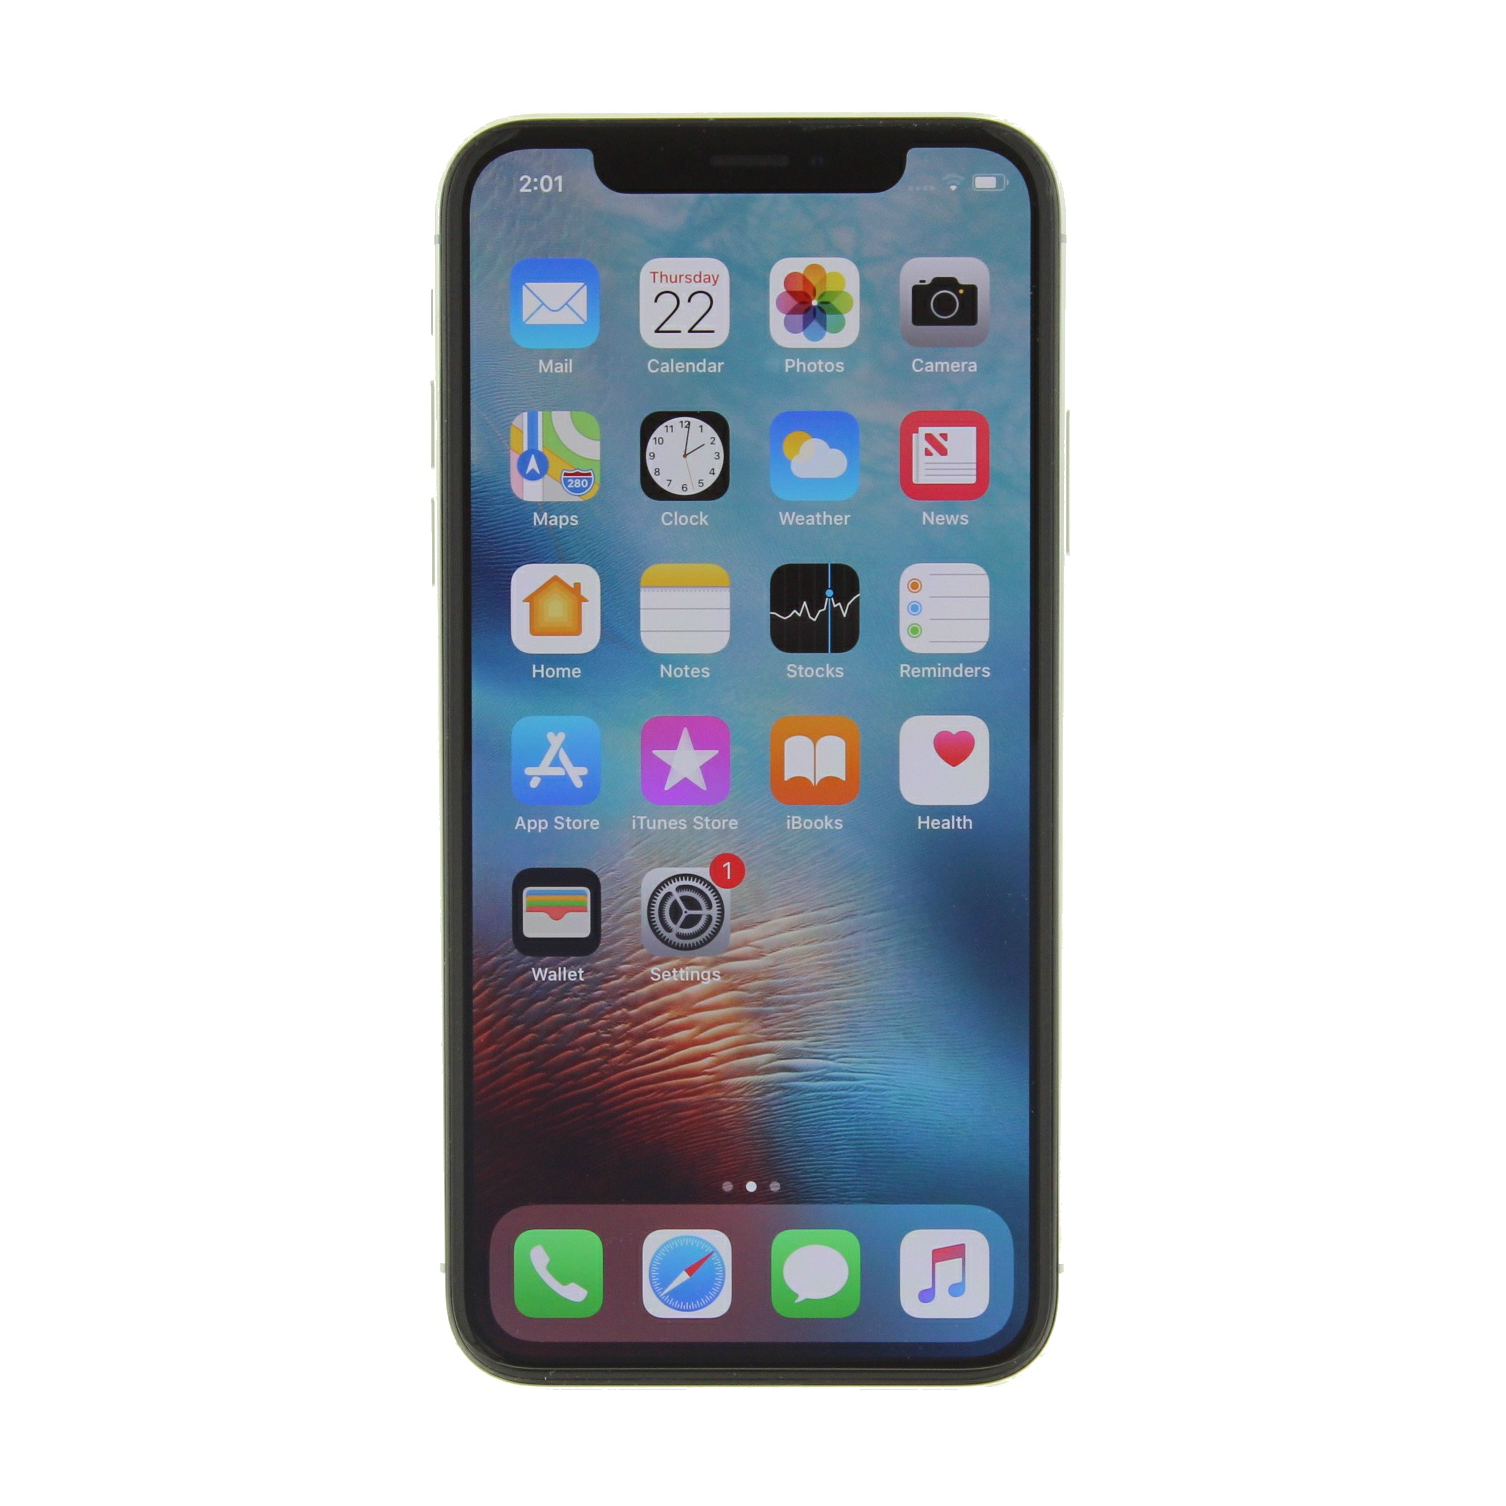 Apple iPhone X a1901 64GB GSM Unlocked (Refurbished ...